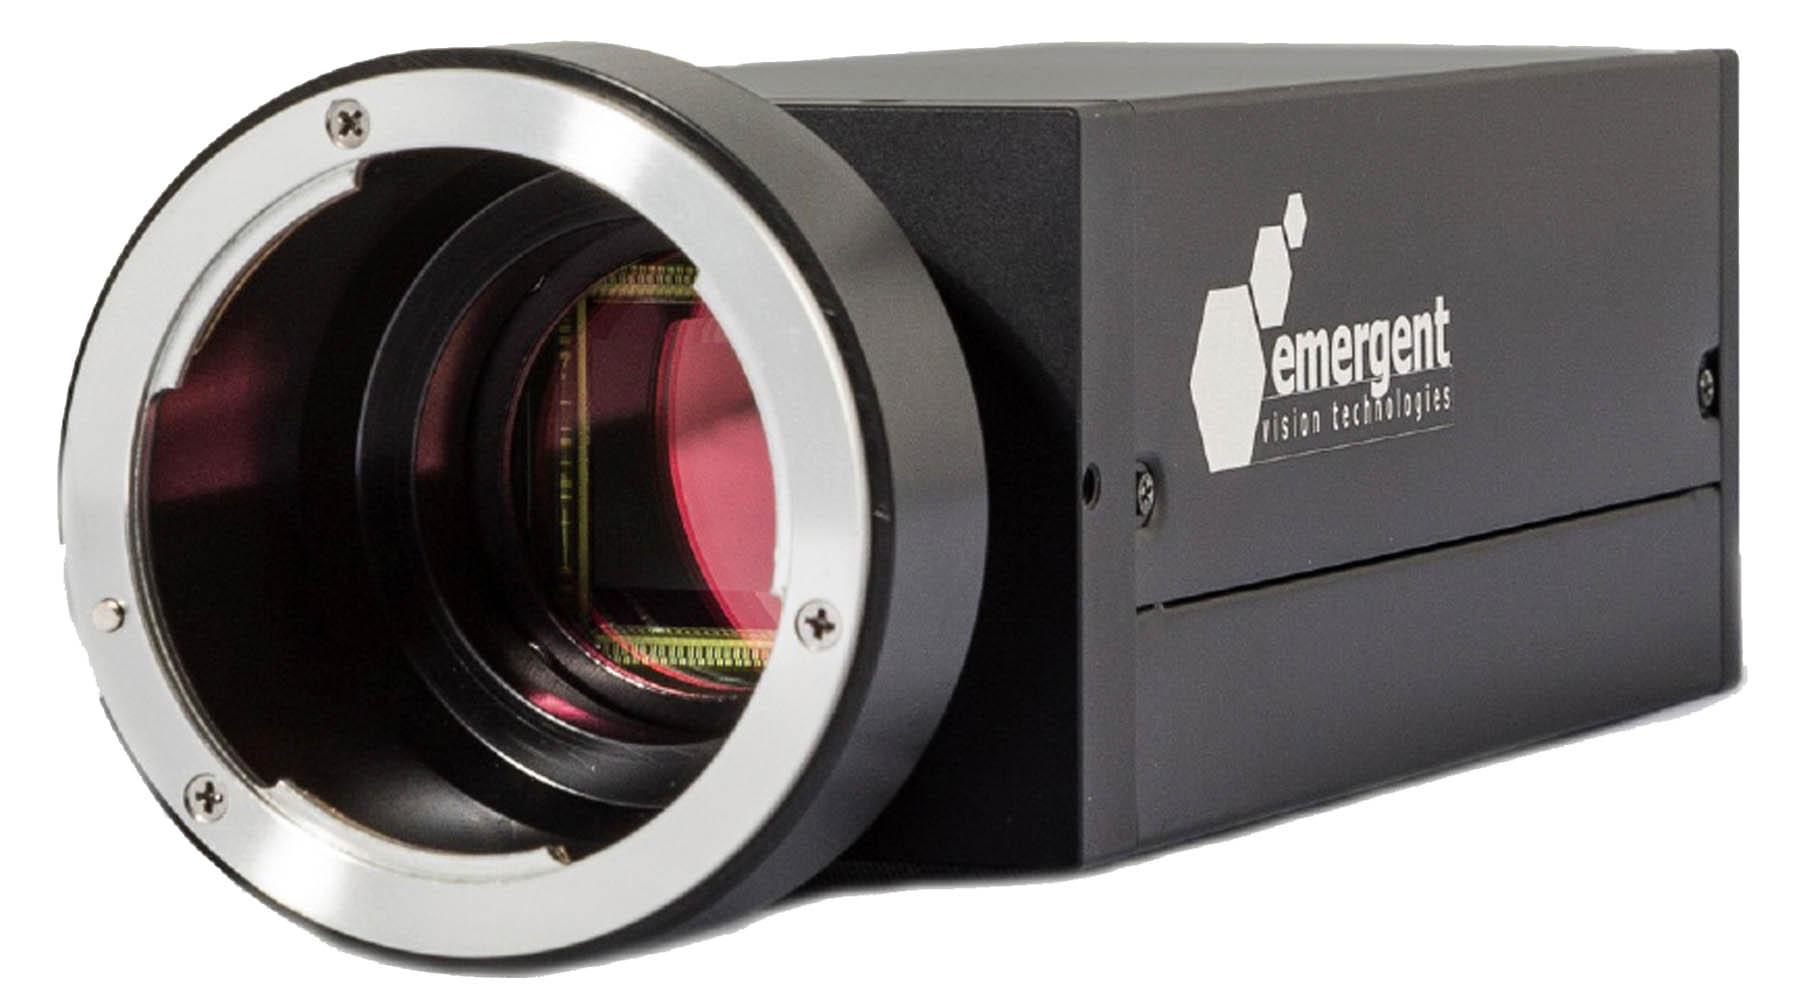 Emergent Vision Technologies HS 20000 10 Bit CMOS 10GigE Camera